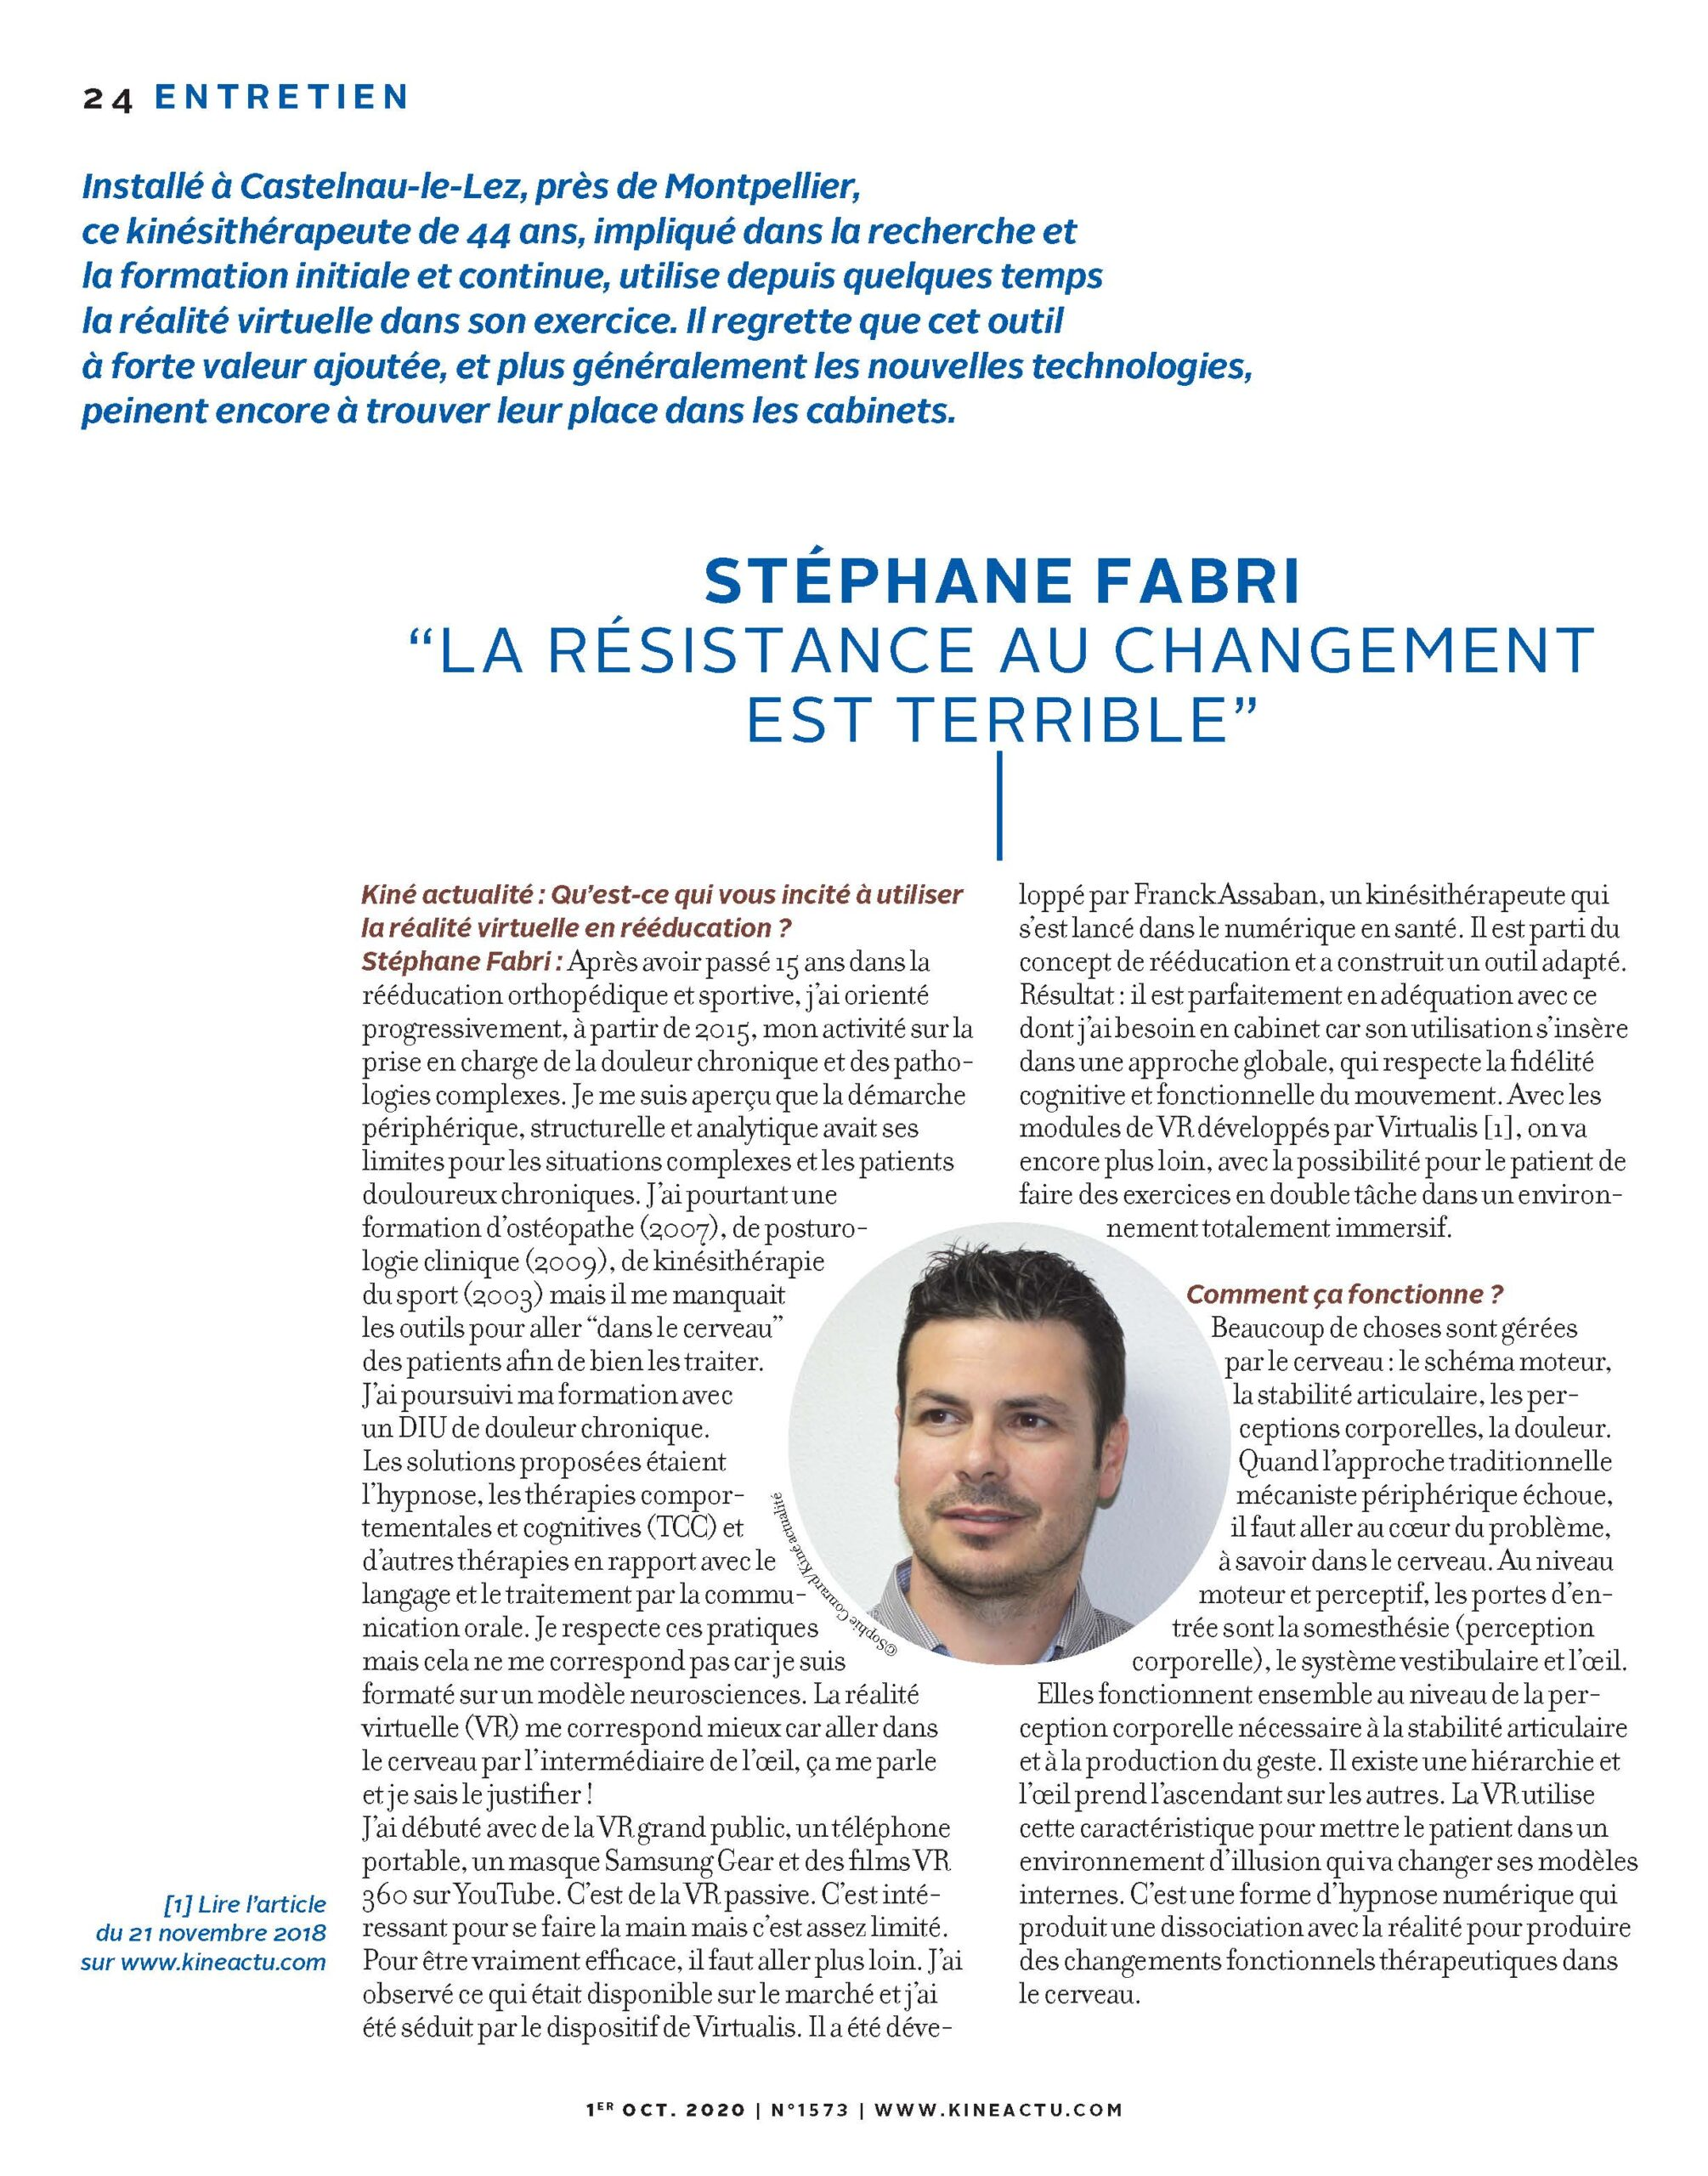 Stéphane Fabri